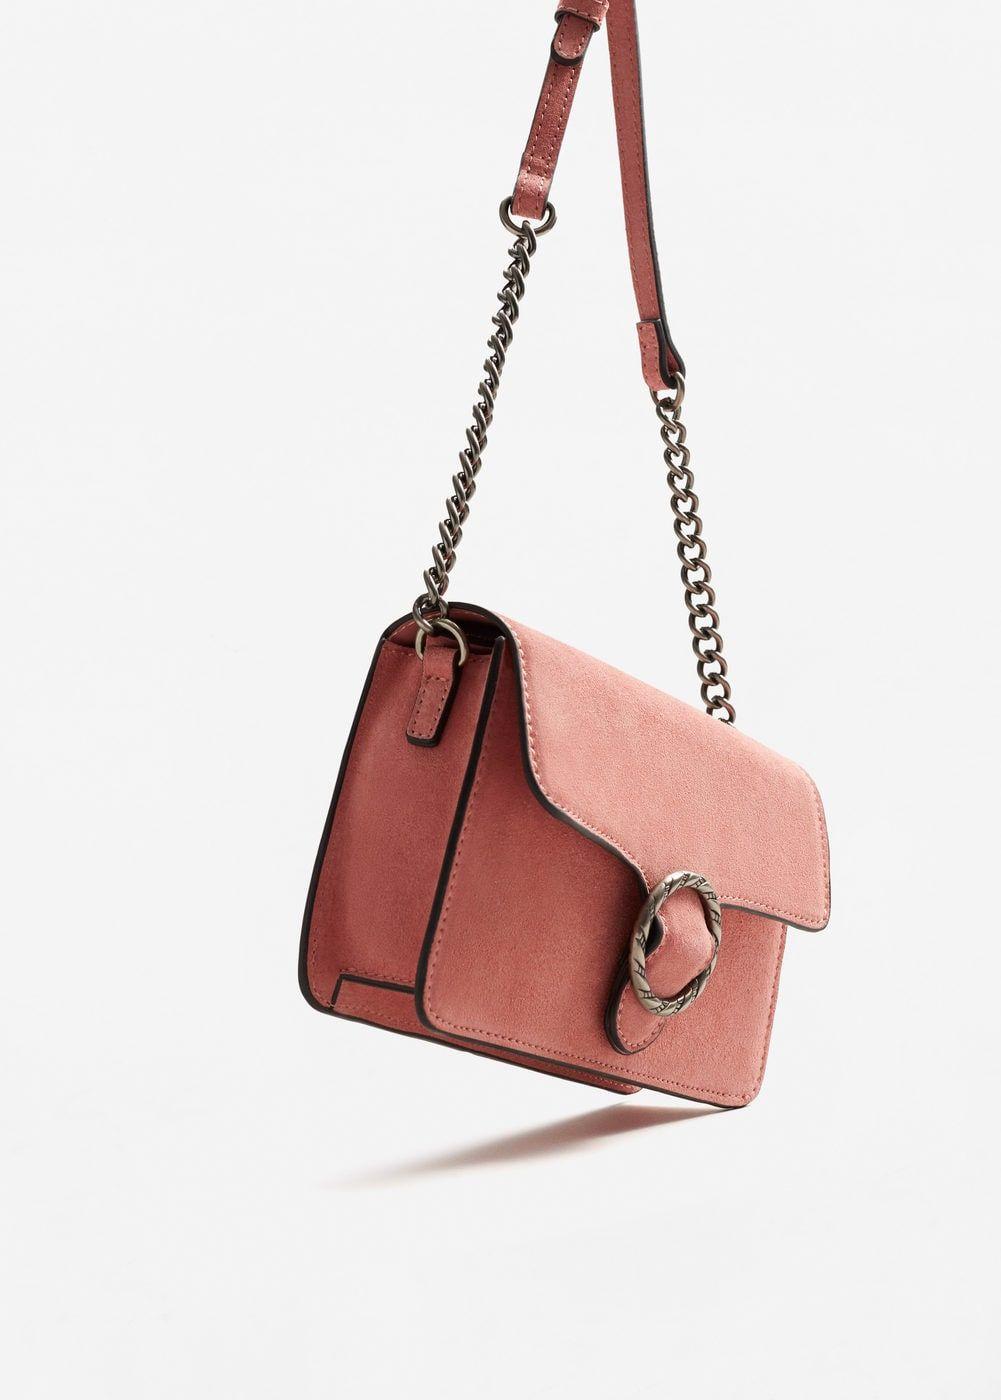 Leather WomenHandbags Et BagsDesign Bag Buckle iTZuPOkX